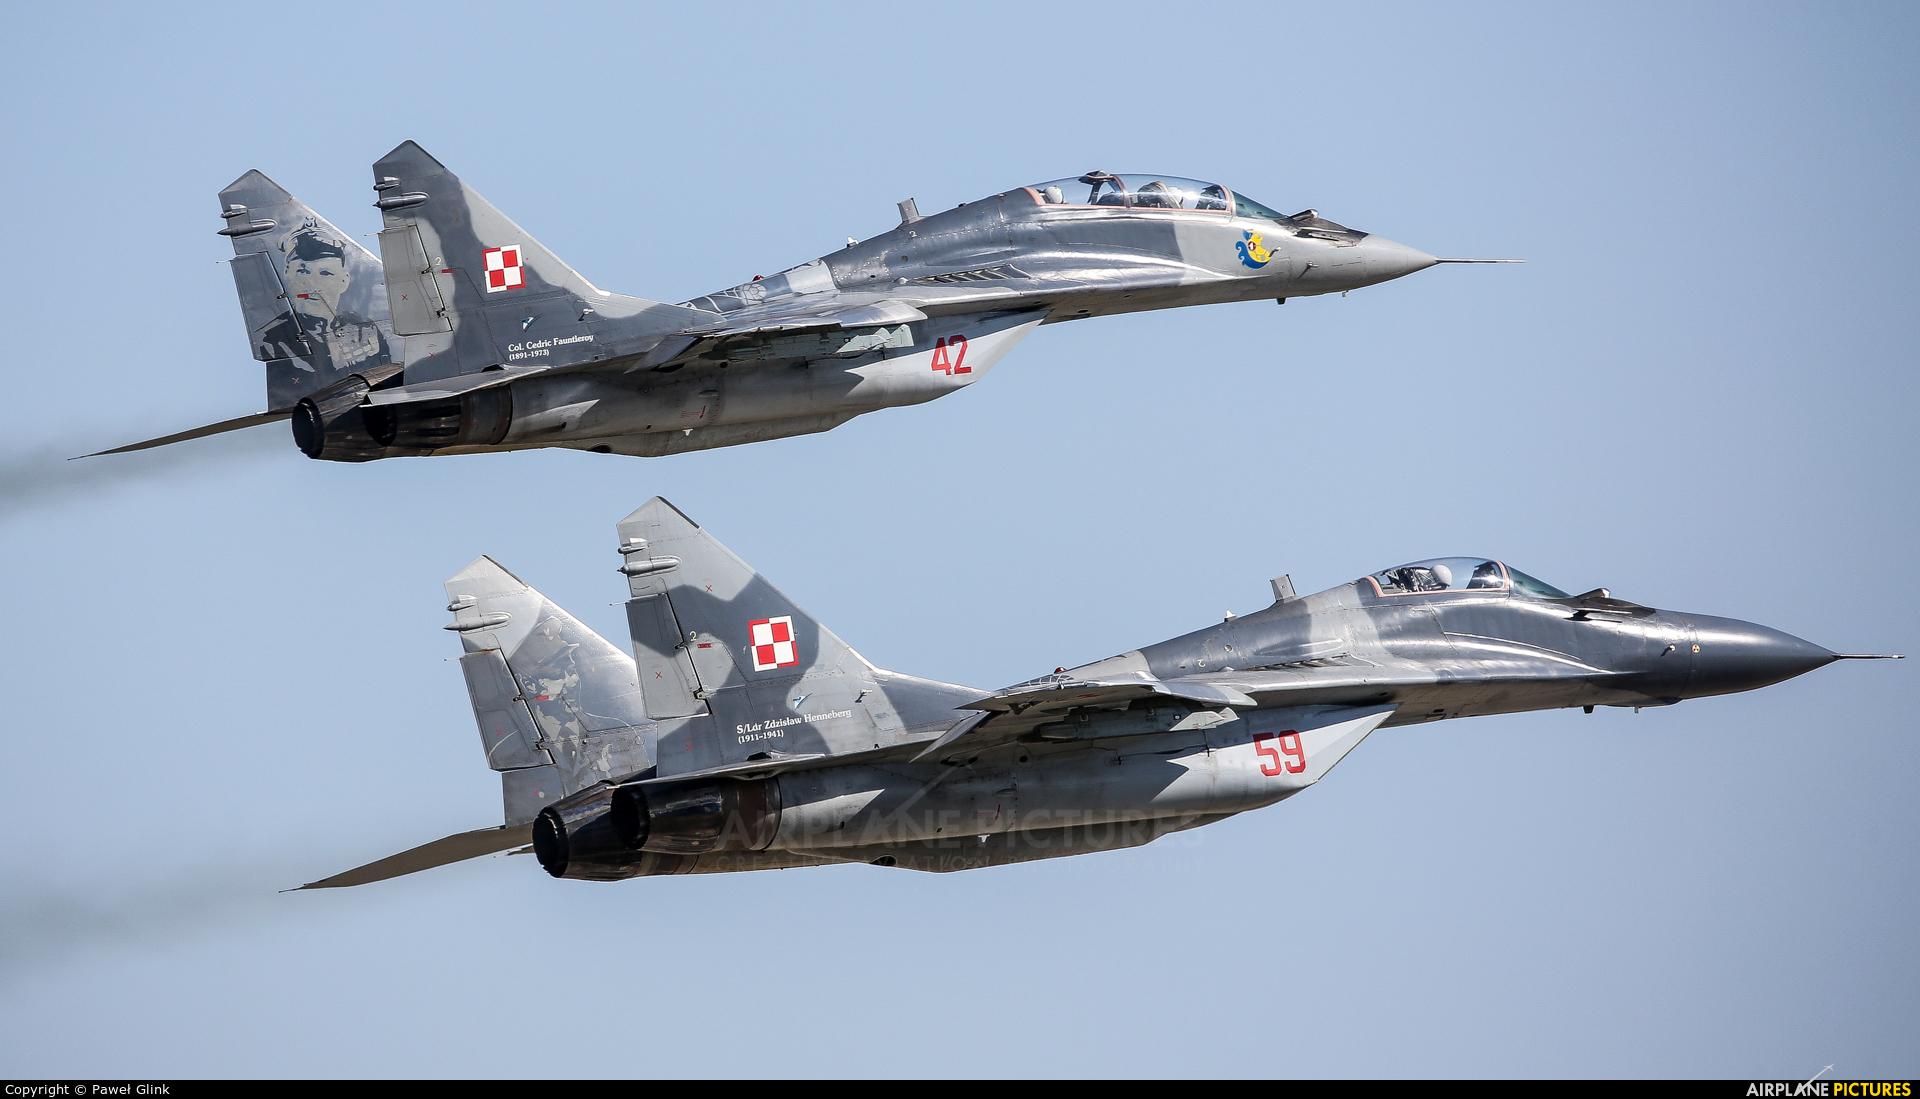 Poland - Air Force 59 aircraft at Mińsk Mazowiecki